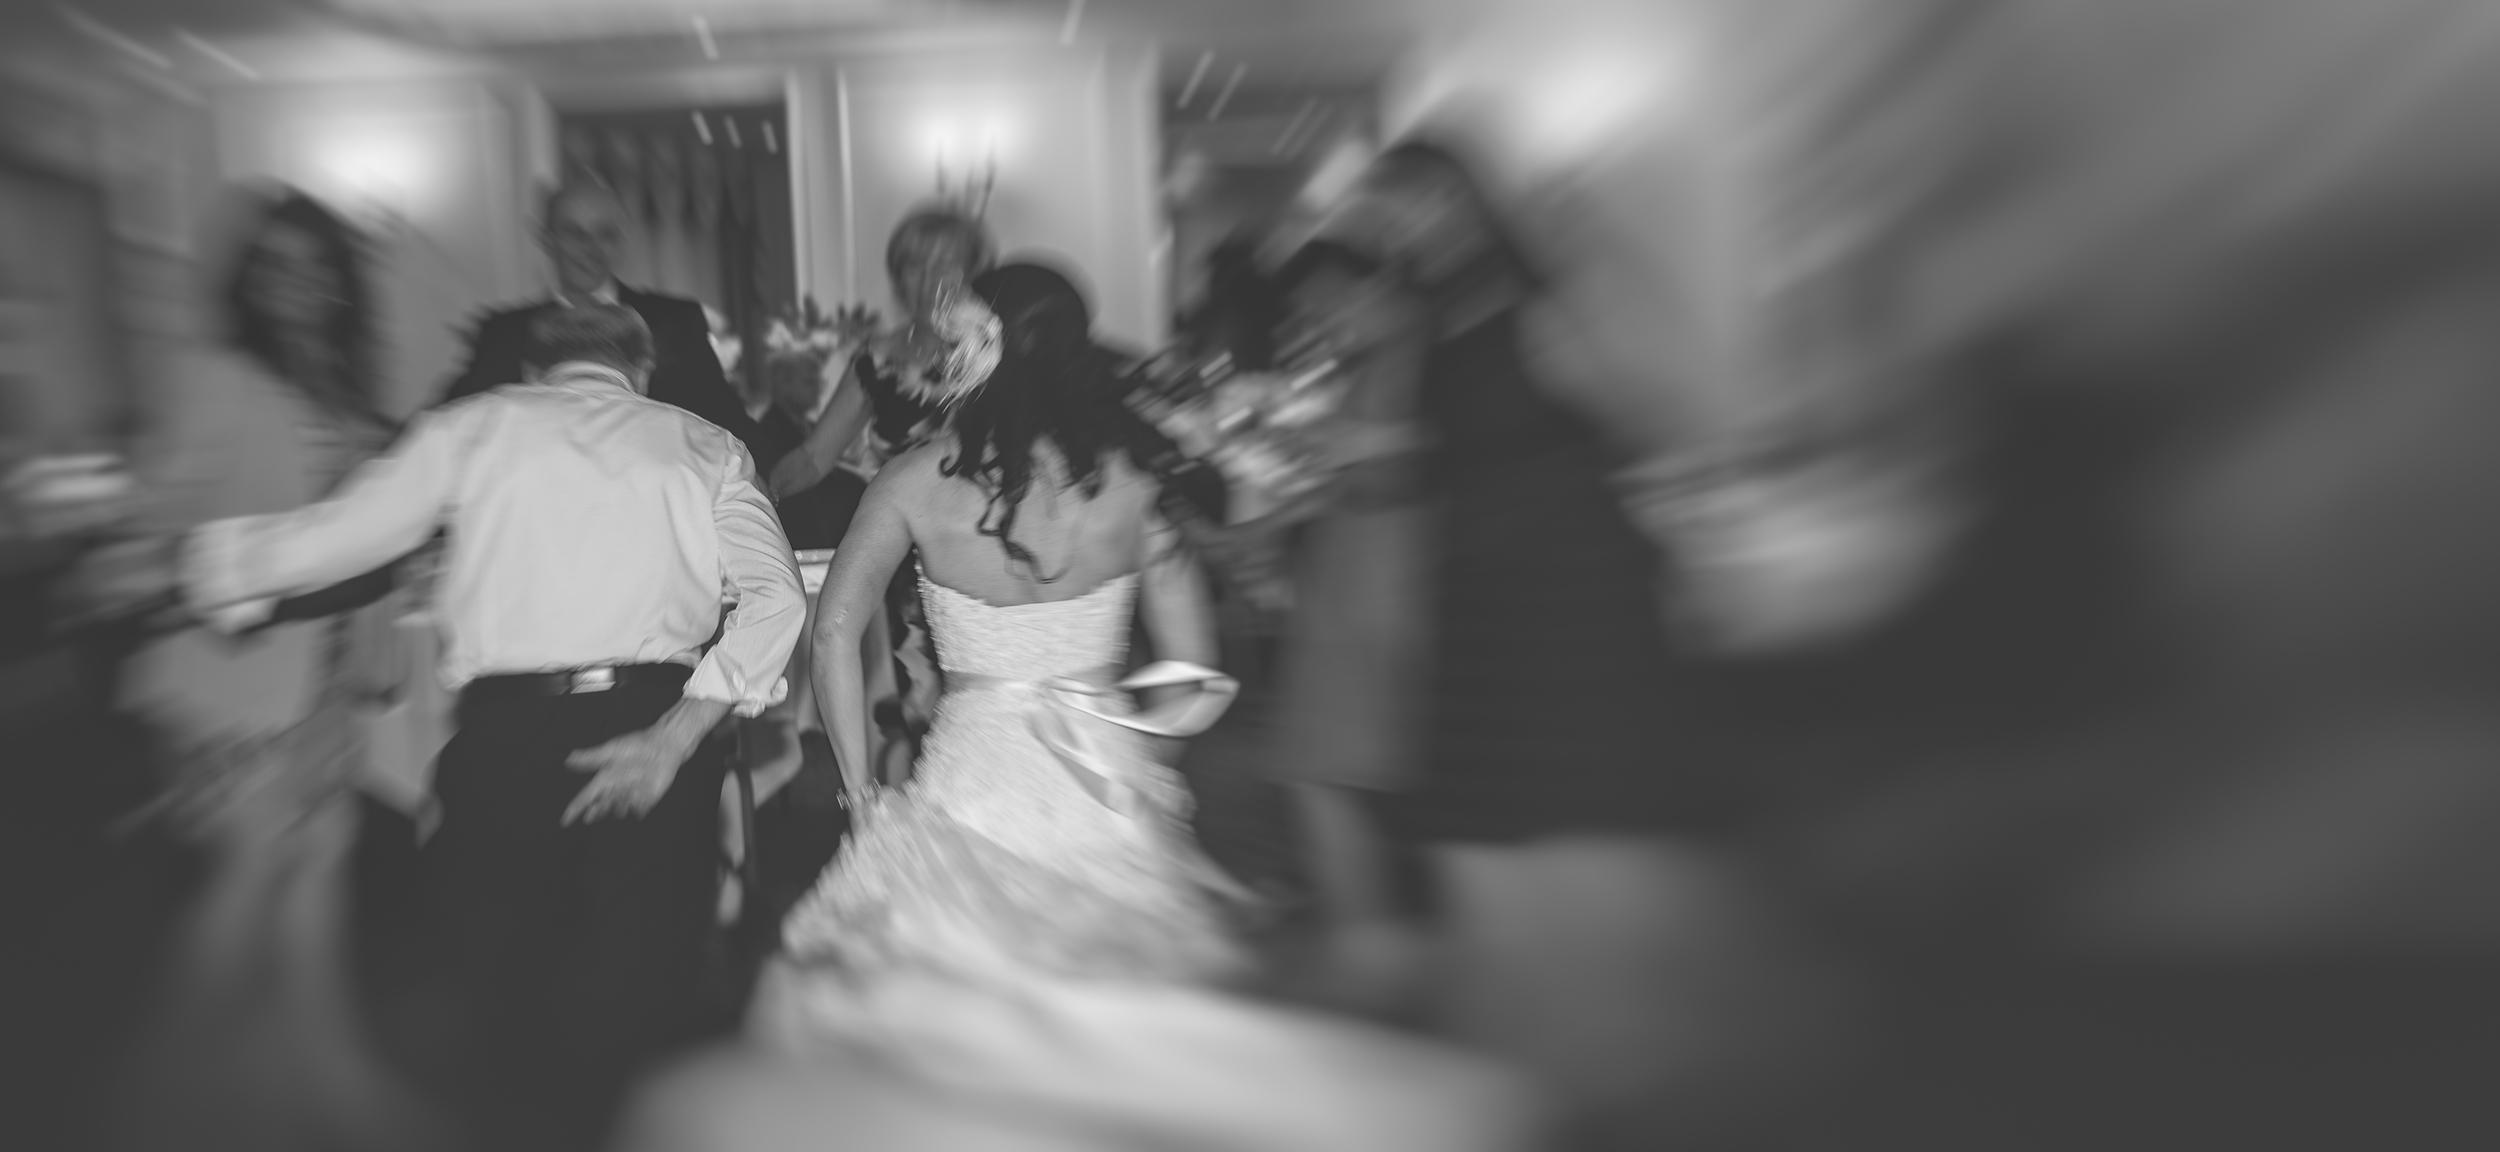 Crazy fast Romaninan dancing